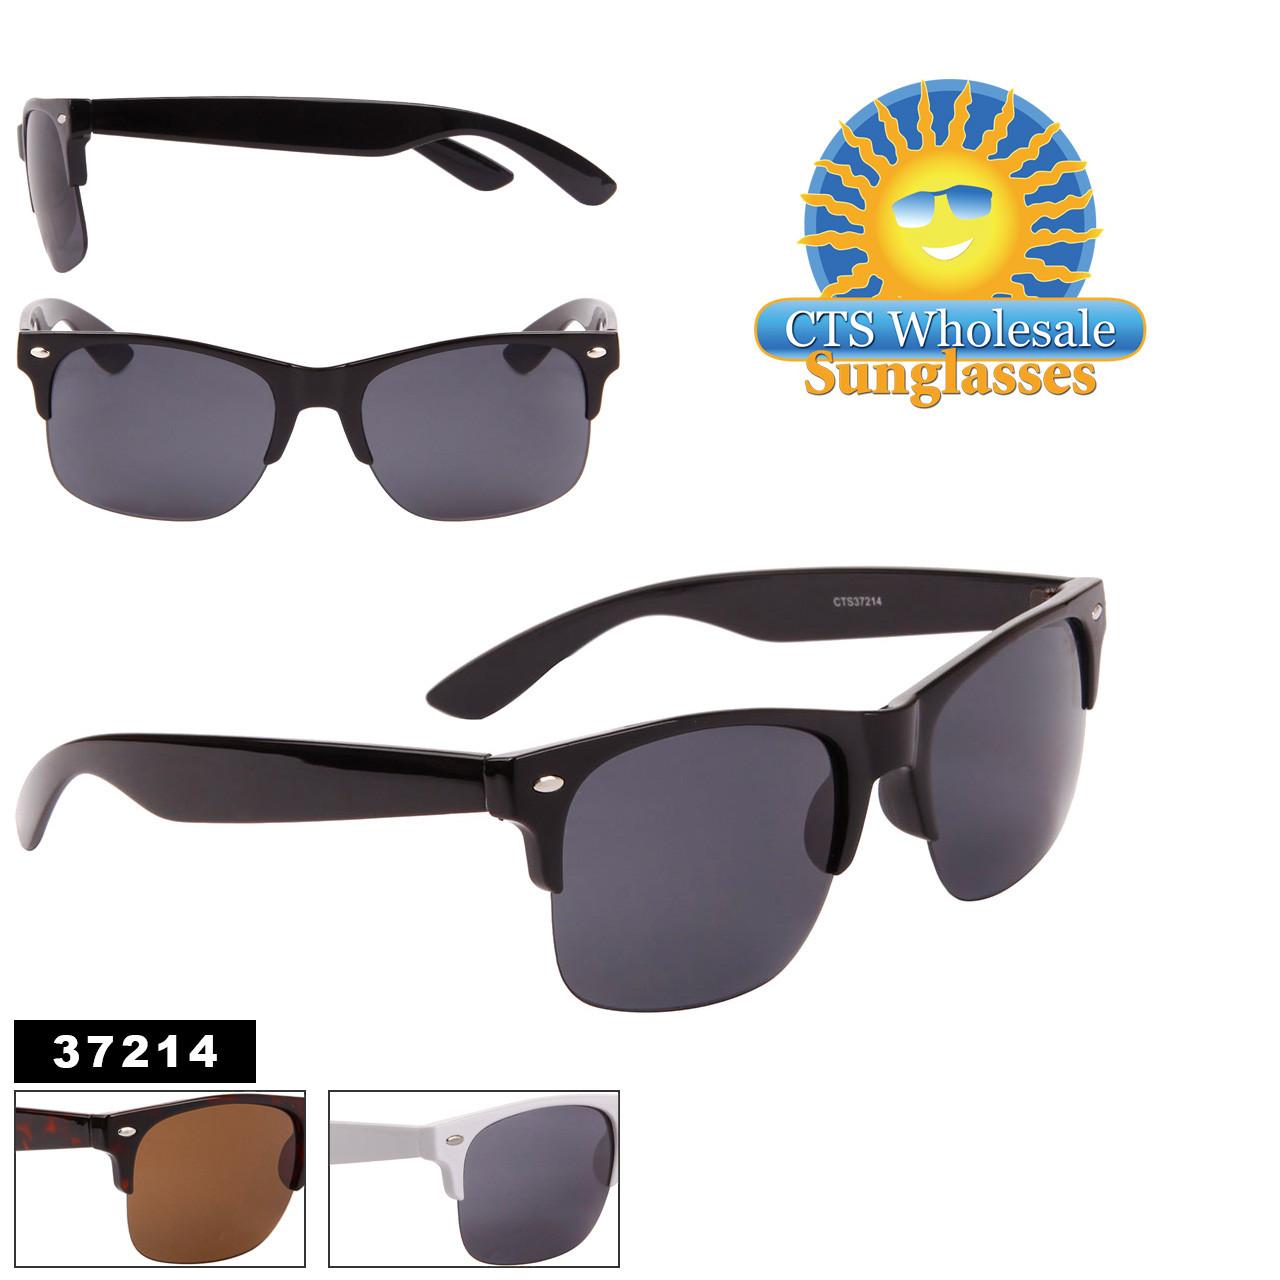 Unisex Sunglasses in Bulk - Style #37214